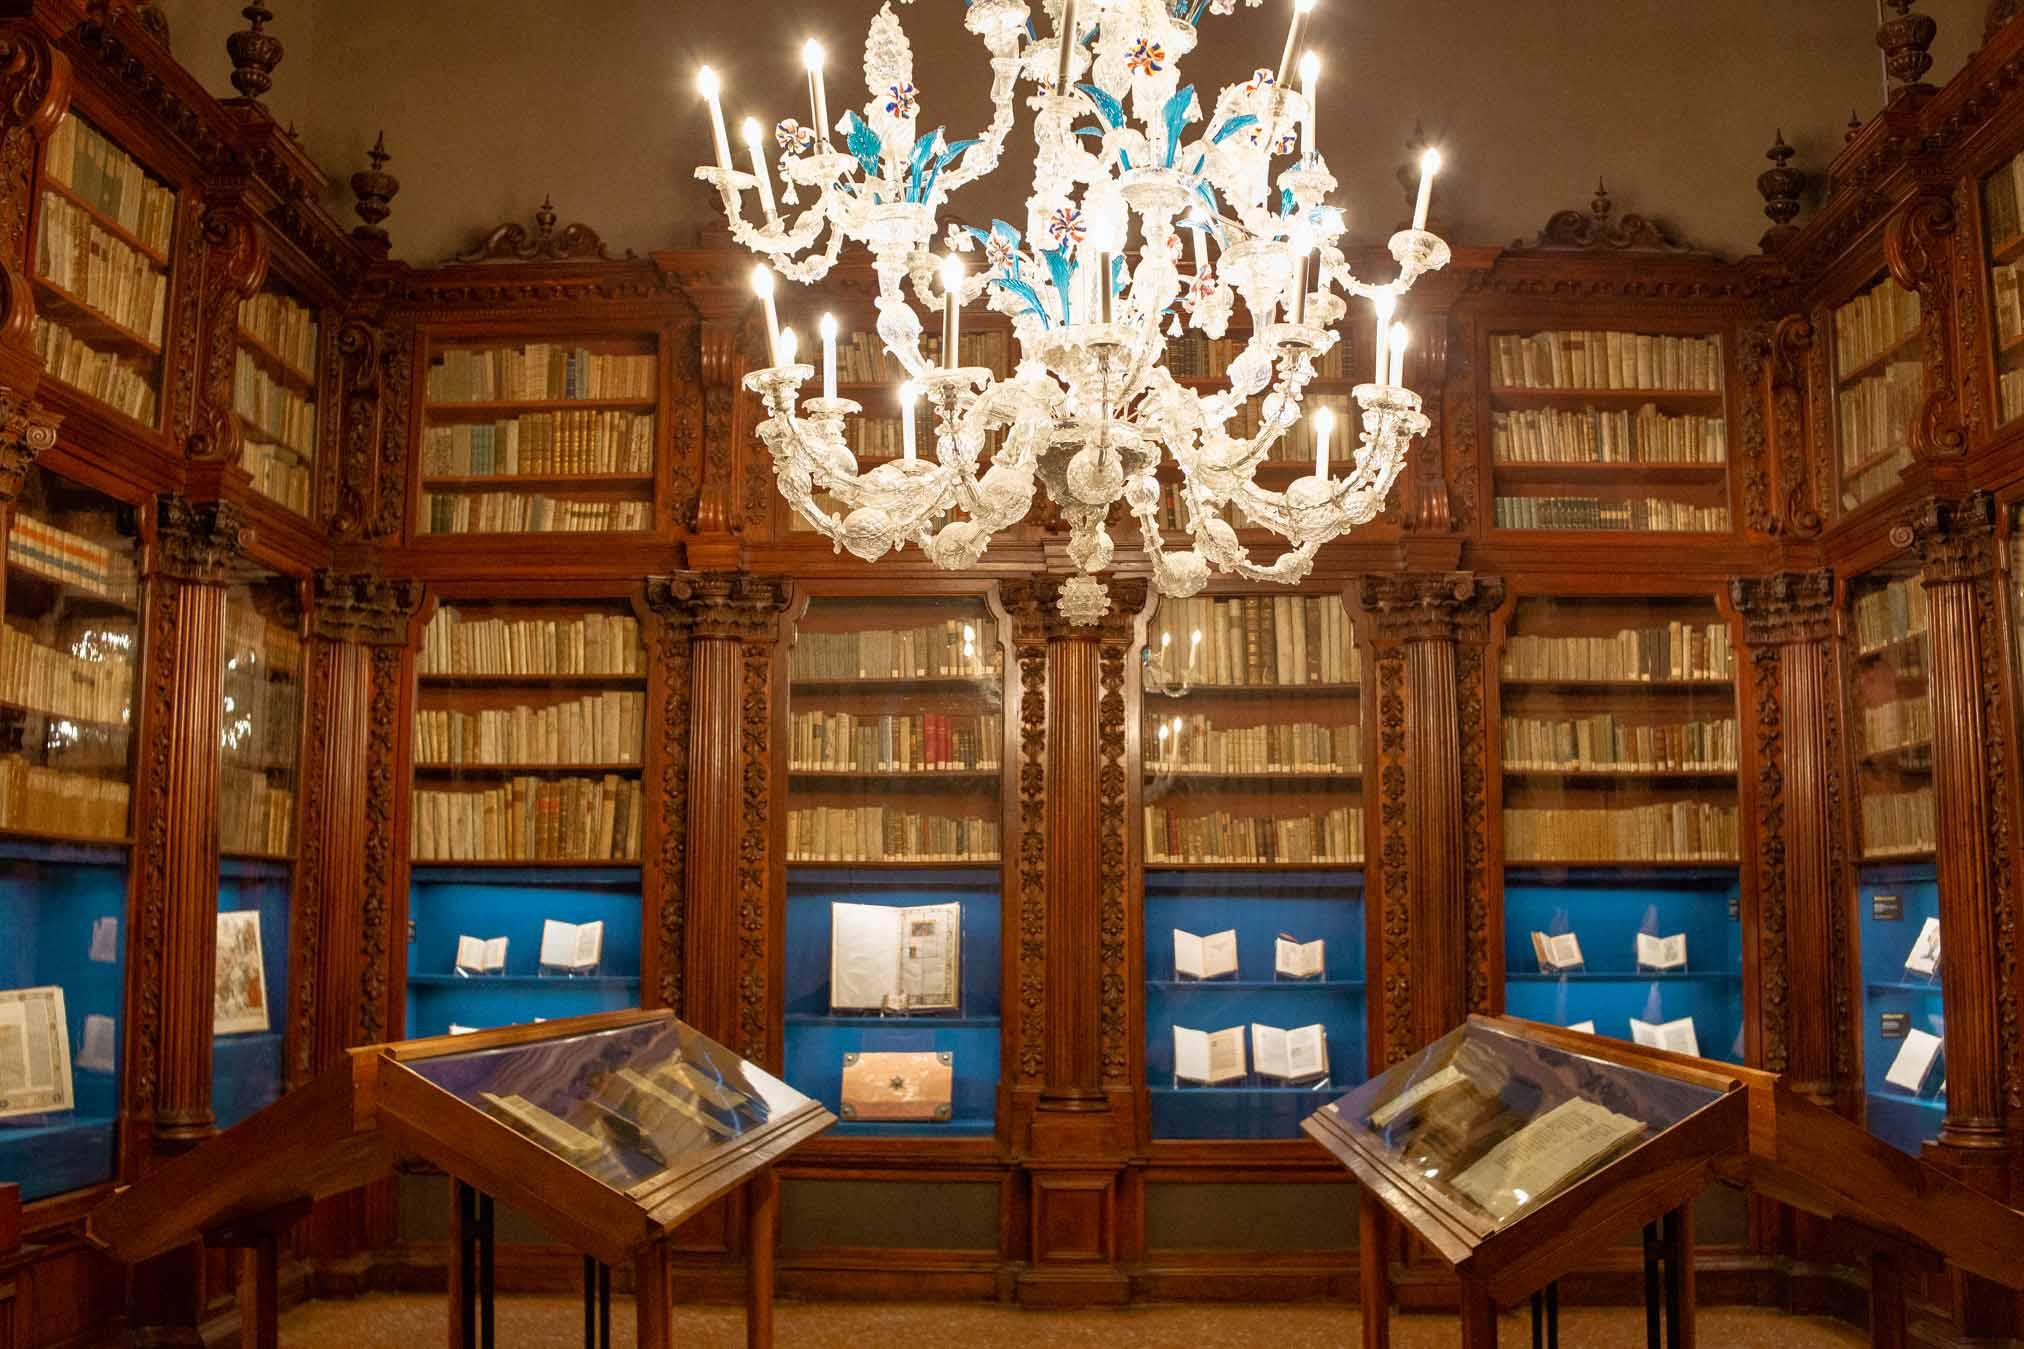 biblioteca del museo correr